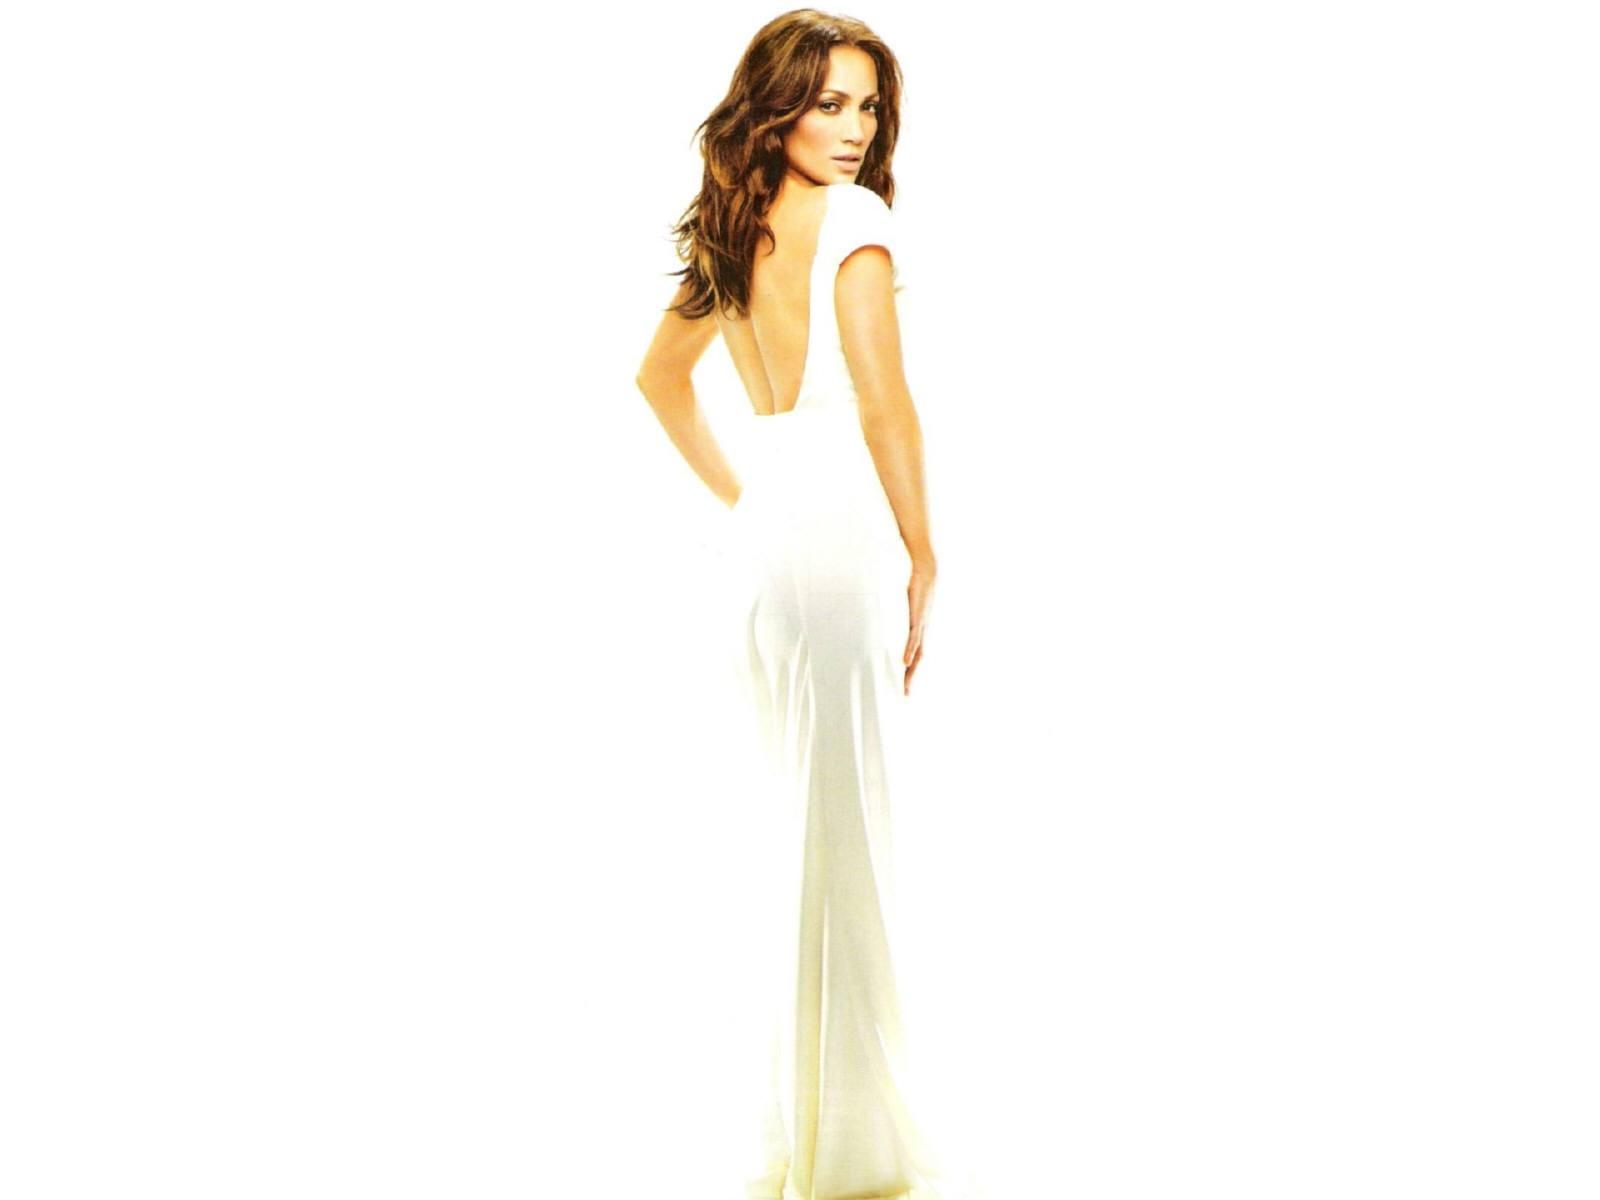 Wallpaper di Jennifer Lopez, elegante in bianco assoluto